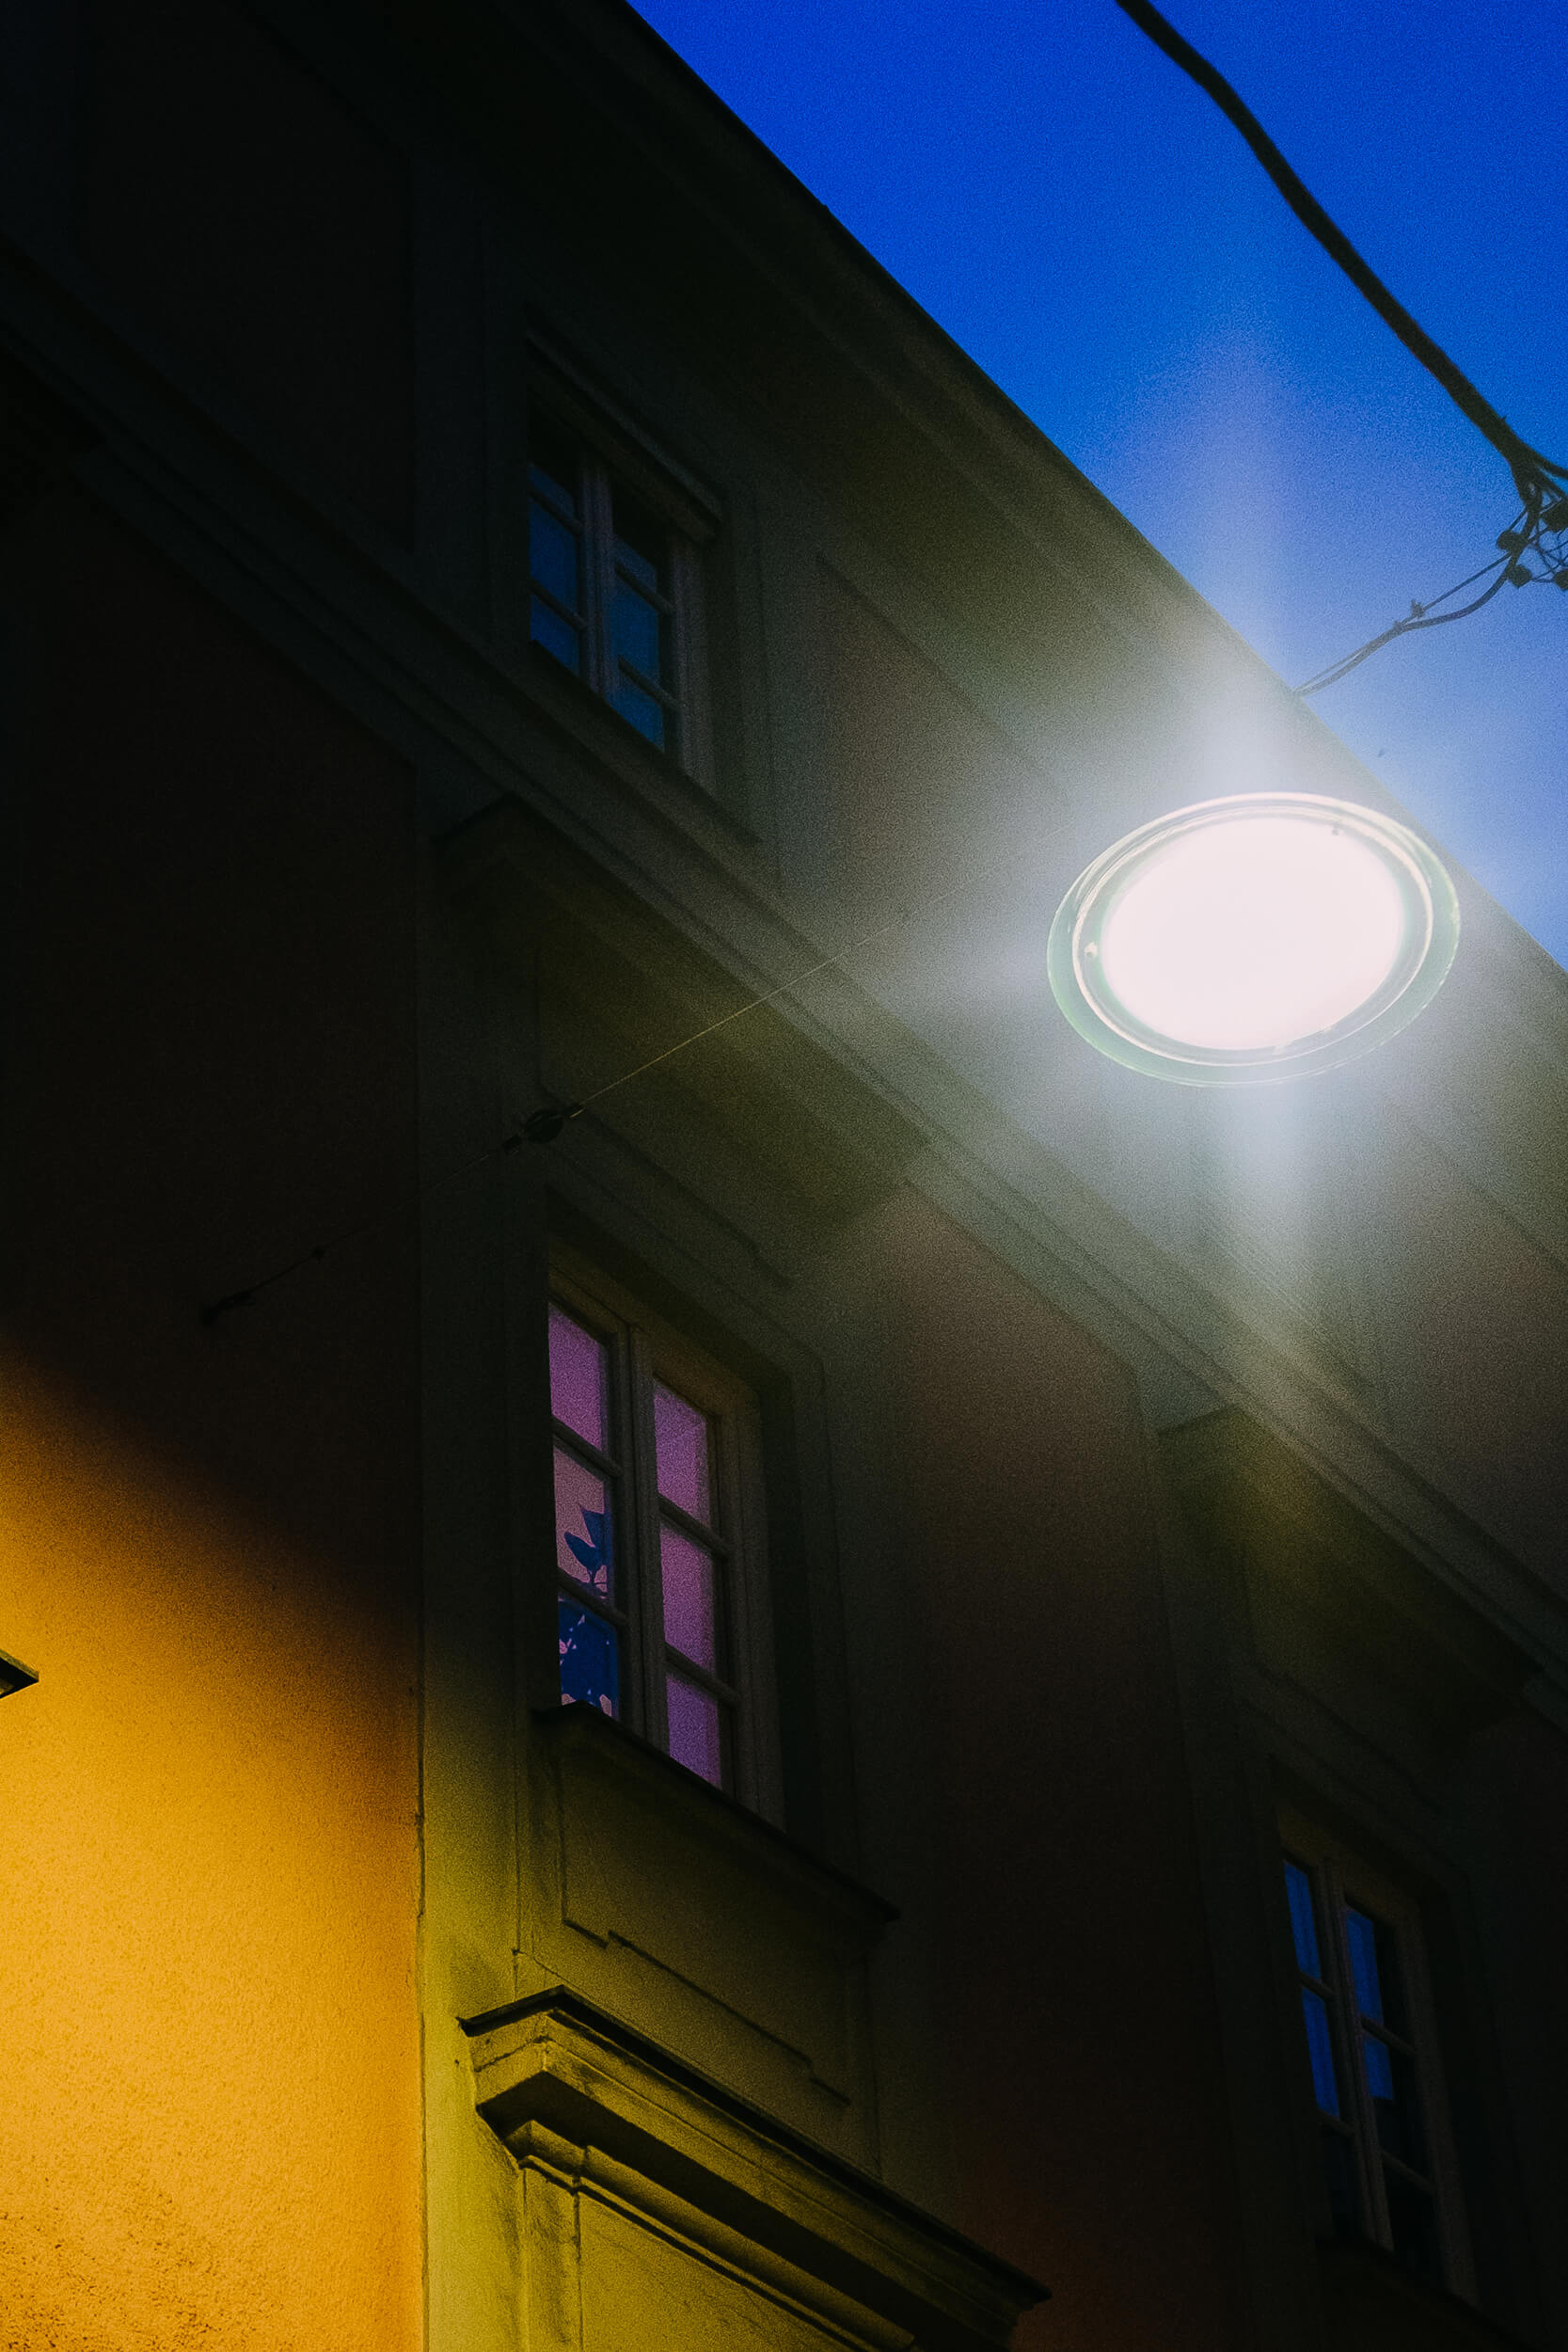 strangers-windows-night-vienna.jpg